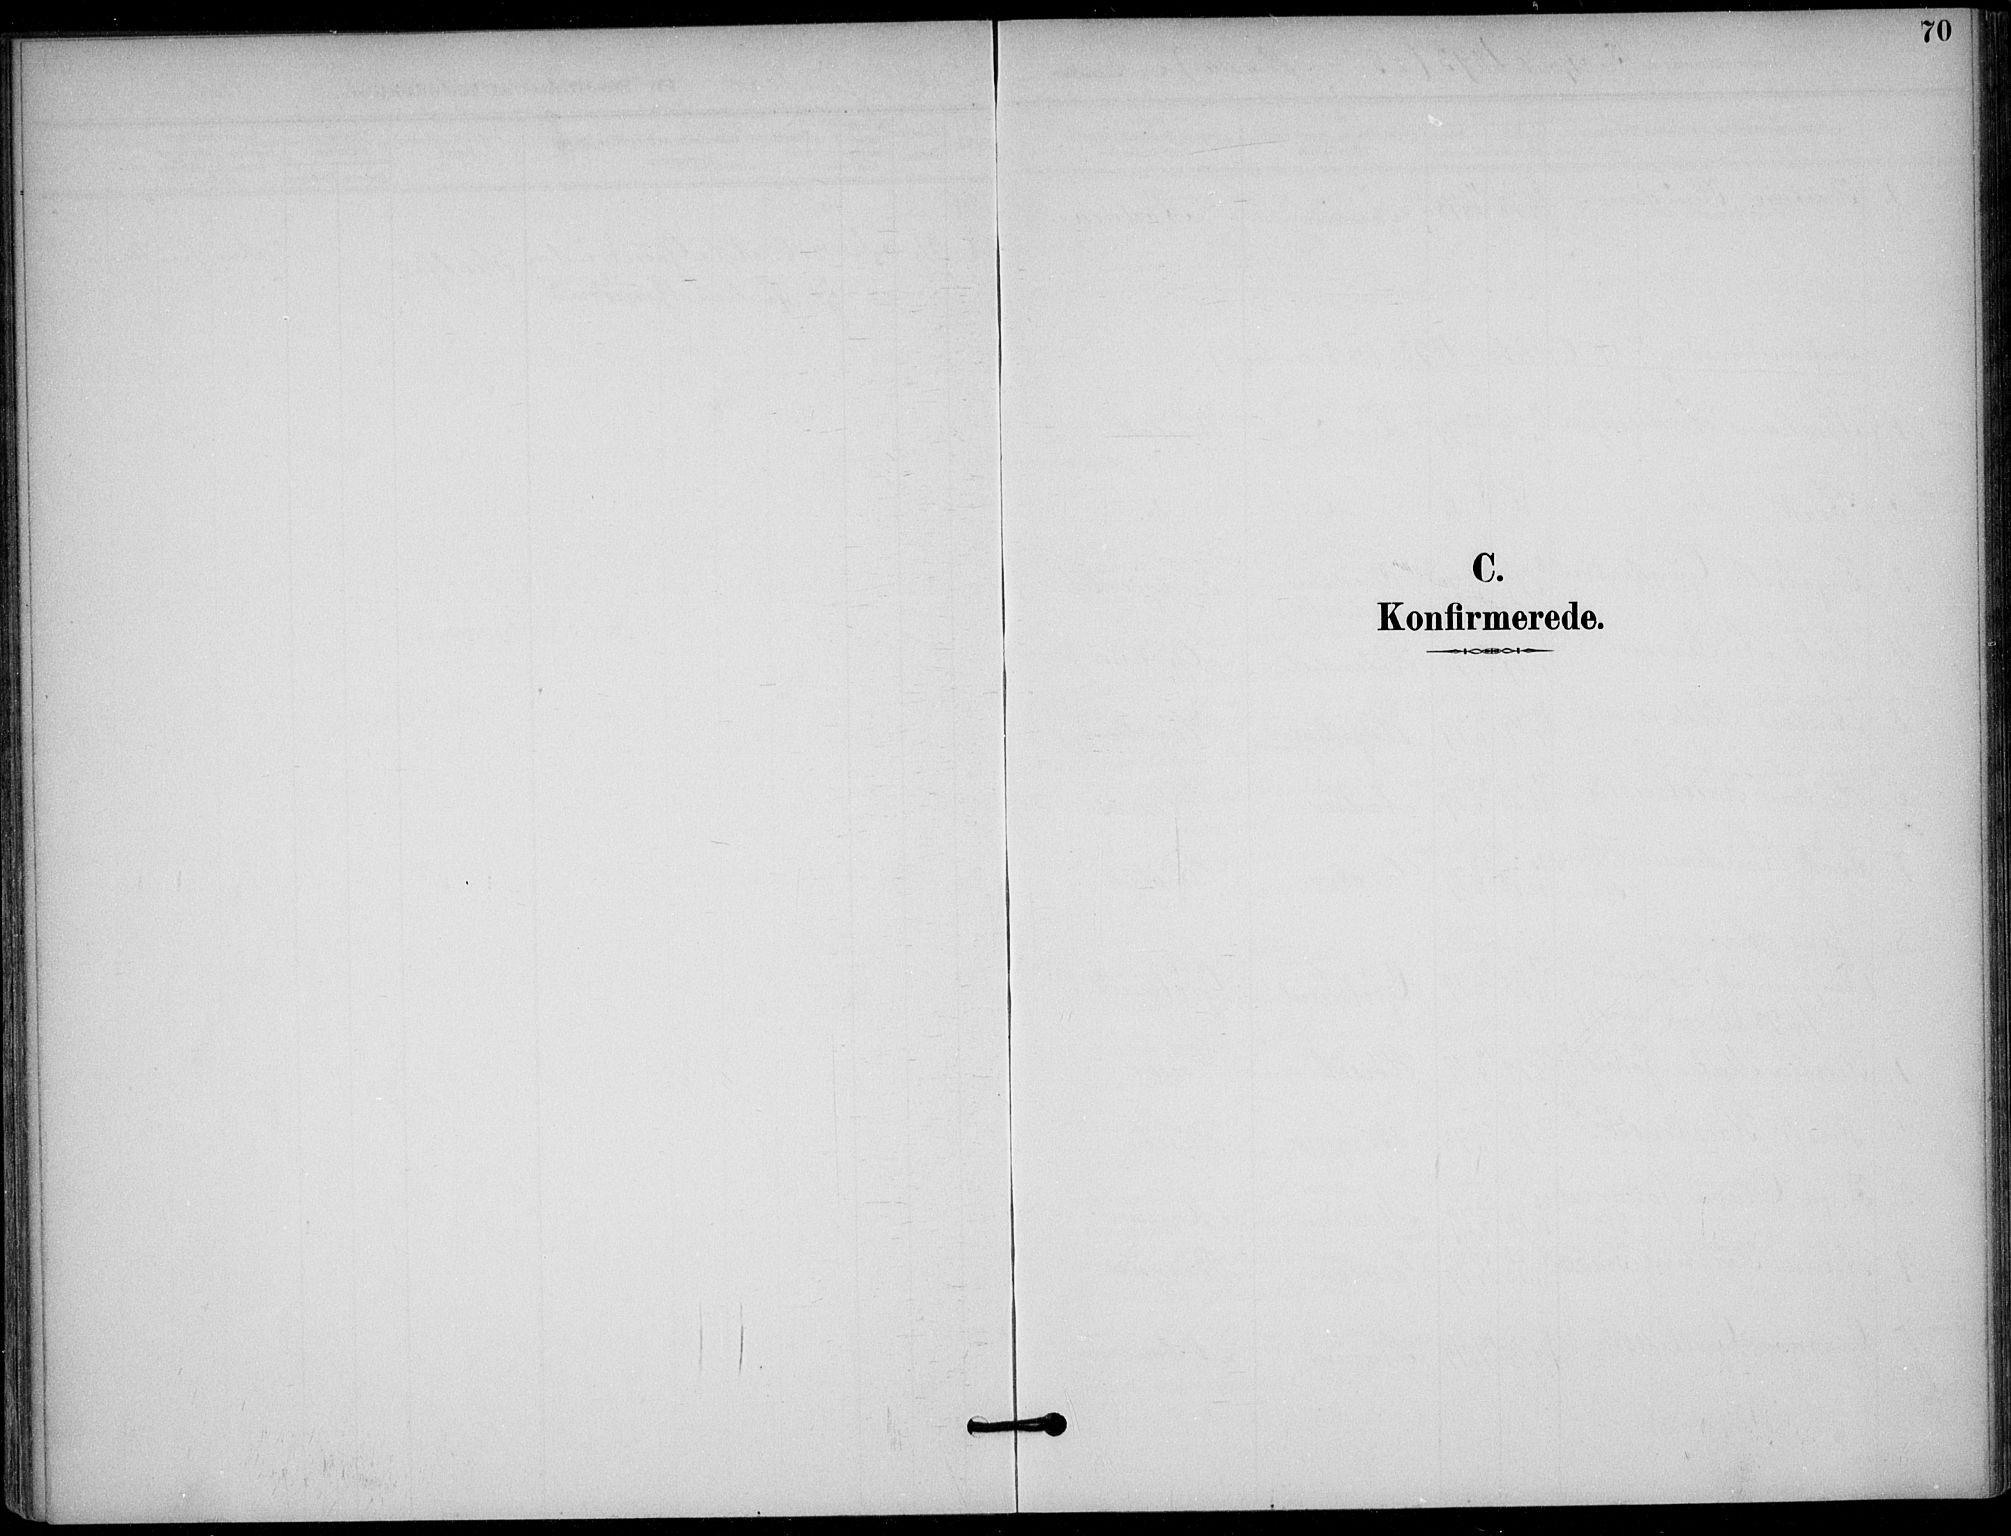 SAKO, Solum kirkebøker, F/Fb/L0002: Ministerialbok nr. II 2, 1893-1901, s. 70